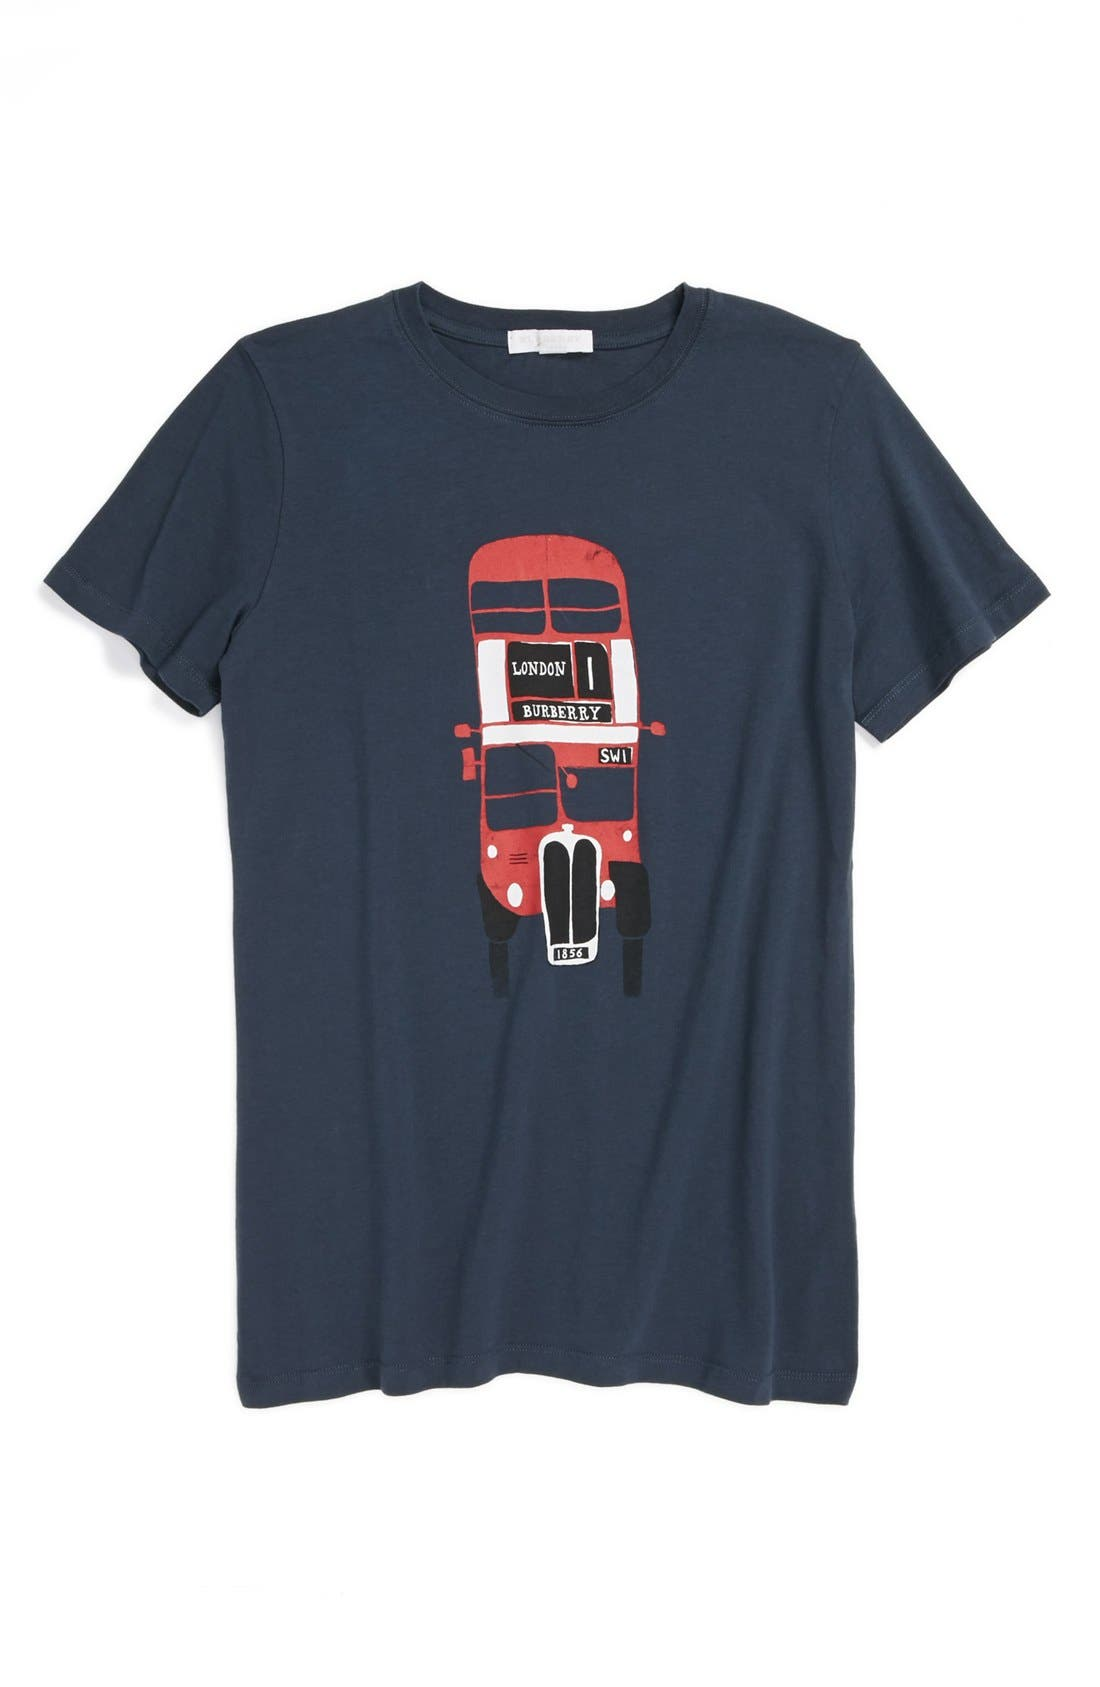 Alternate Image 1 Selected - Burberry Print T-Shirt (Toddler Boys)